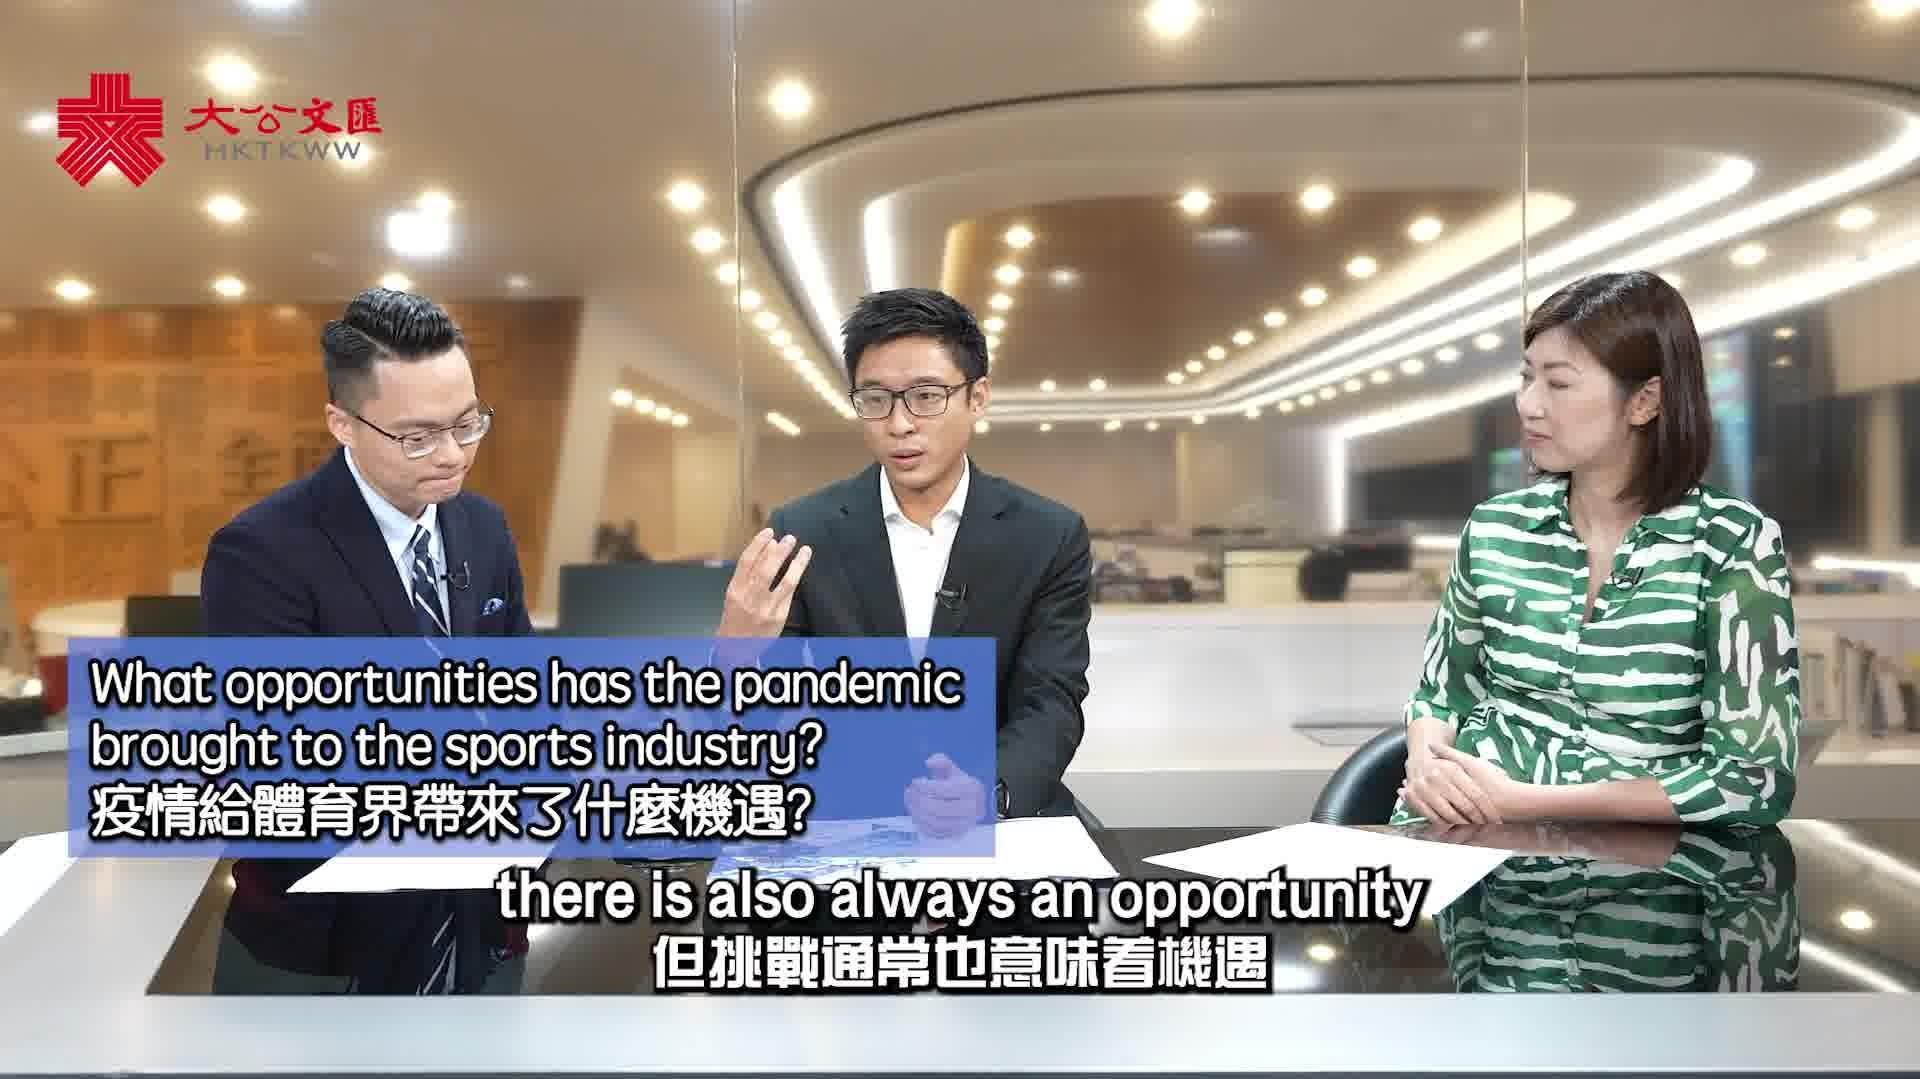 EyE on U 容來熙往 (精華片段)  | 霍啟山:電競受國際認可 香港有廣闊舞台